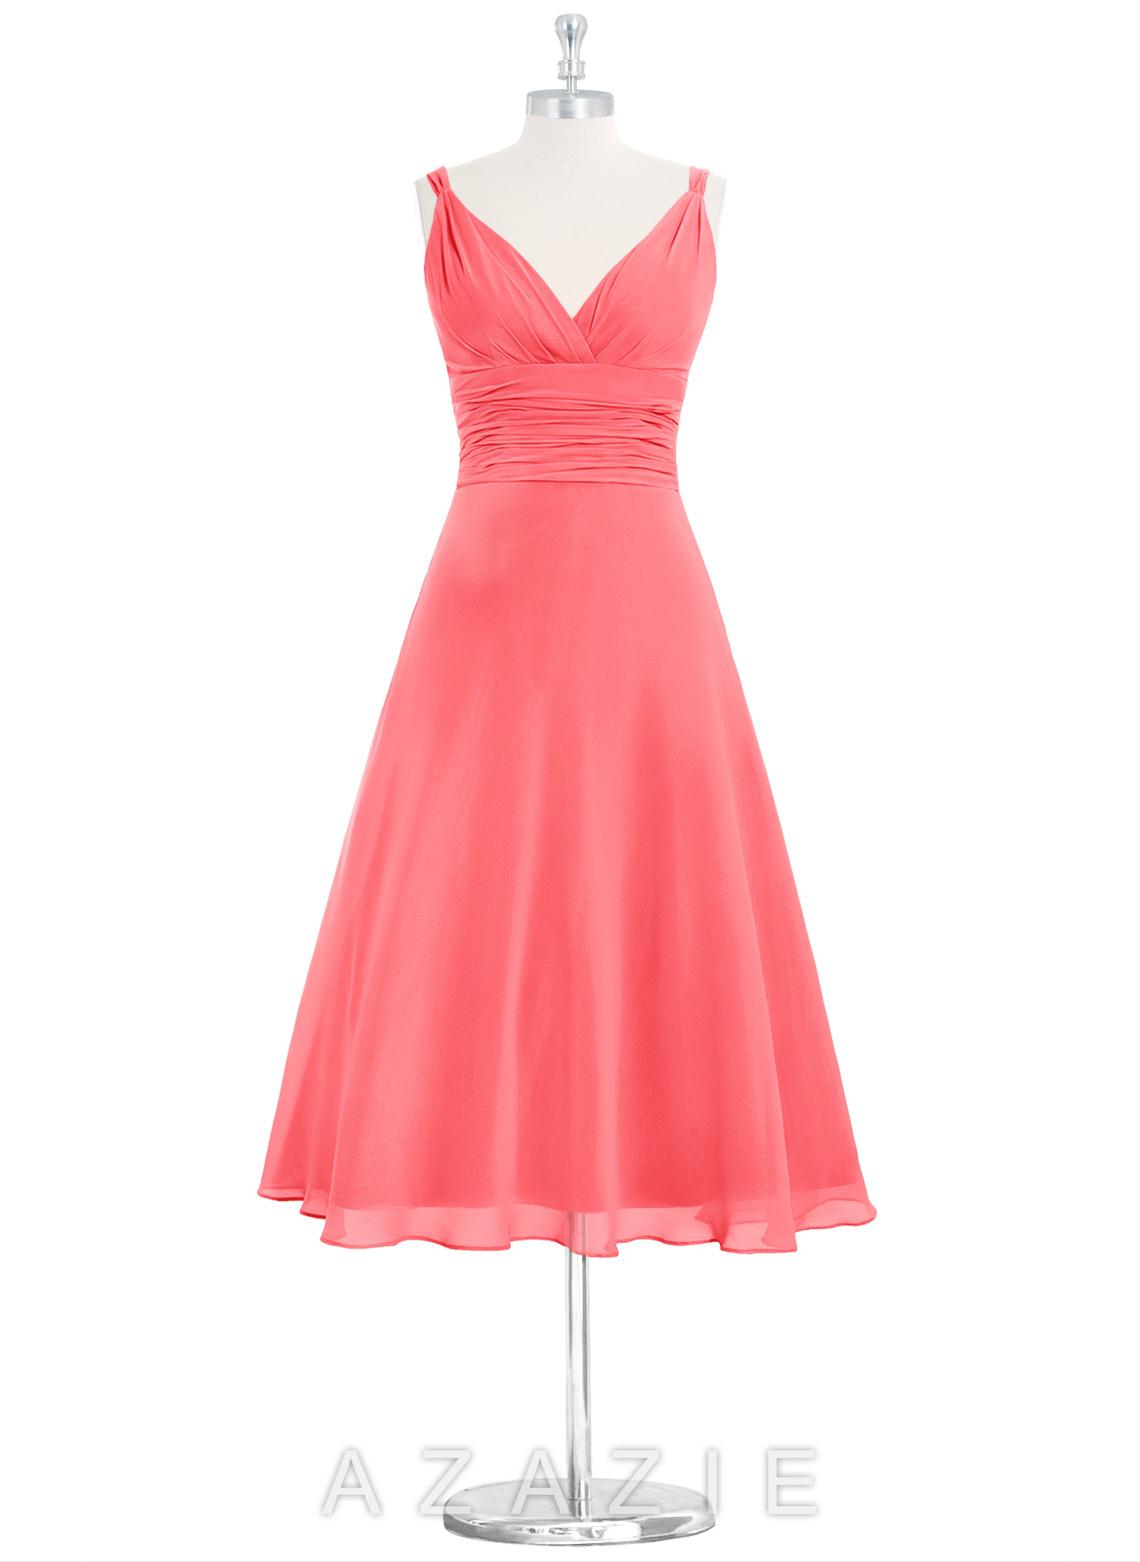 Azazie jayla bridesmaid dress azazie color watermelon ombrellifo Image collections